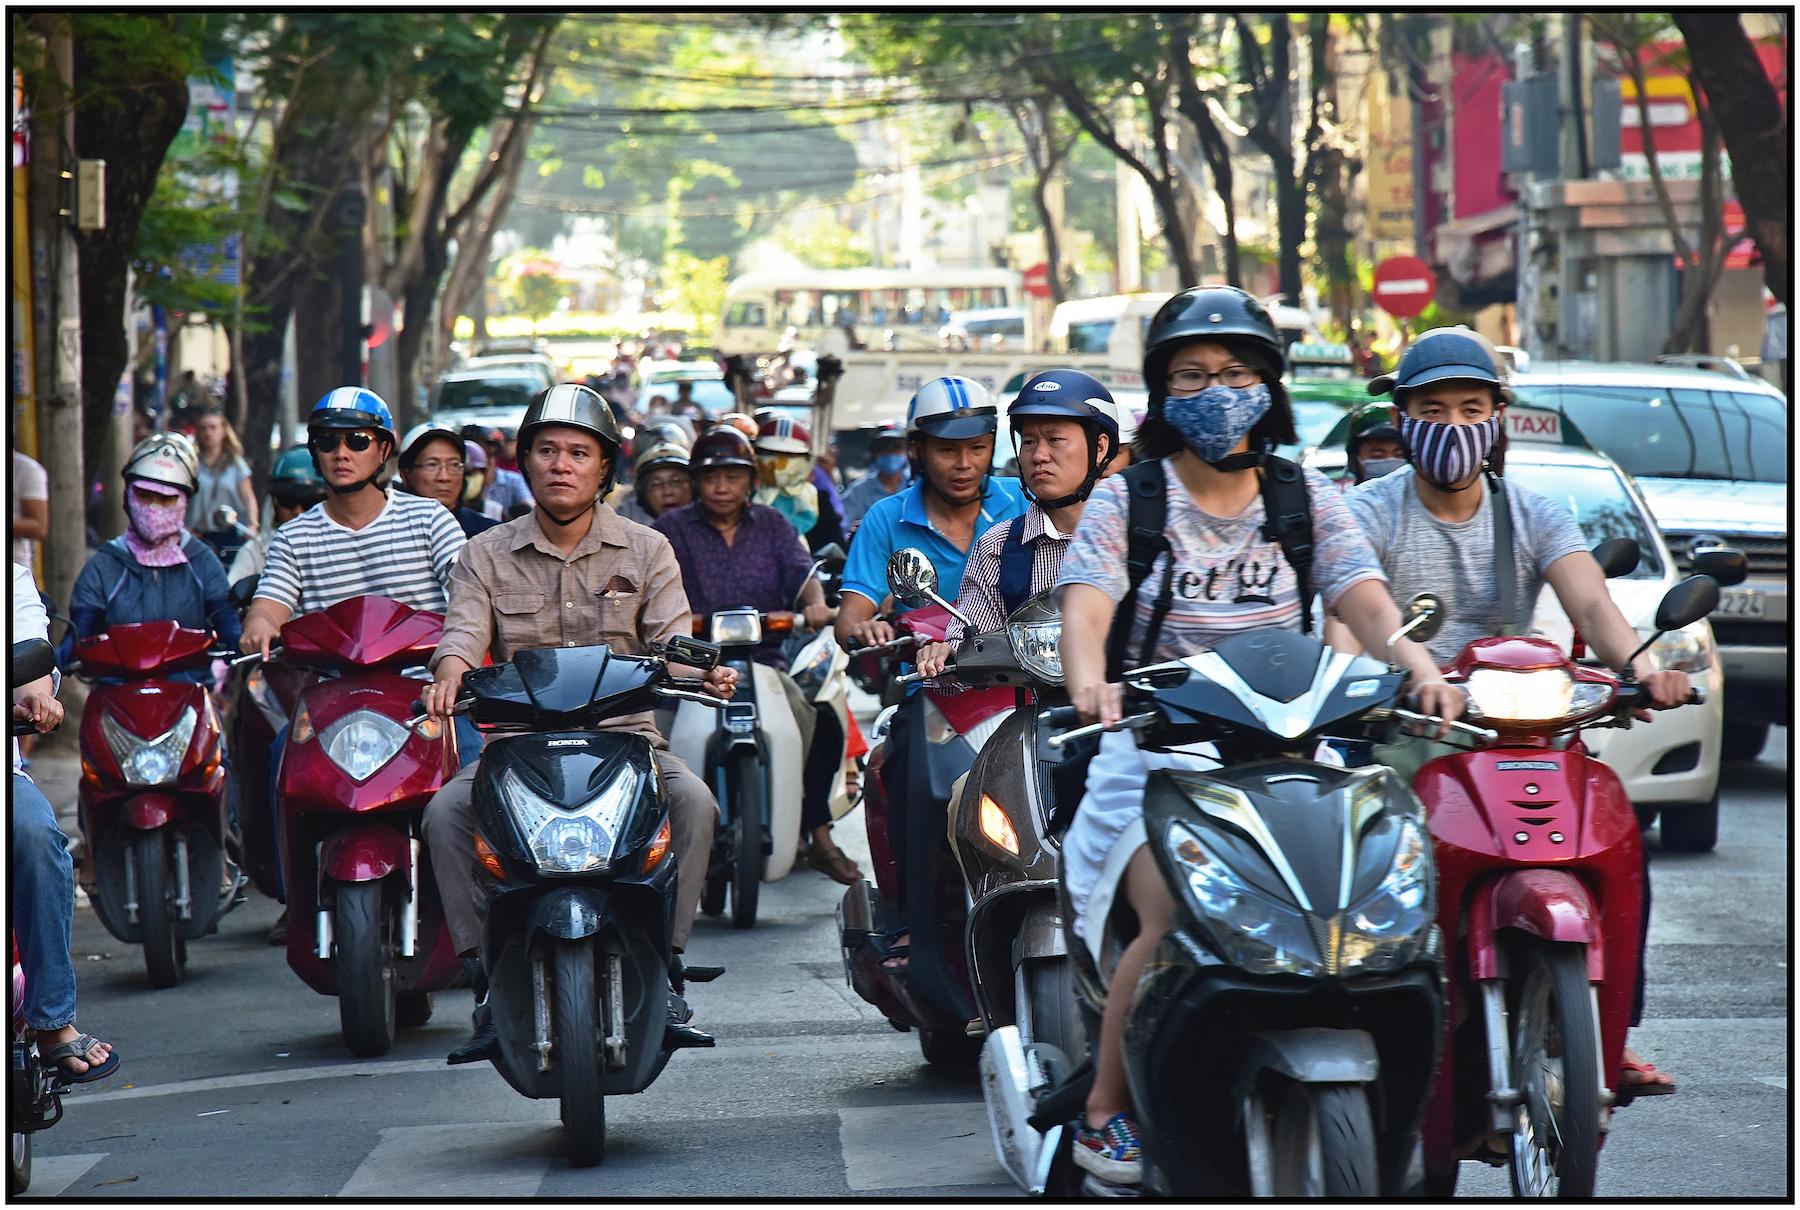 Heavy traffic, Saigon/HCMC, Dec.2015. #2912